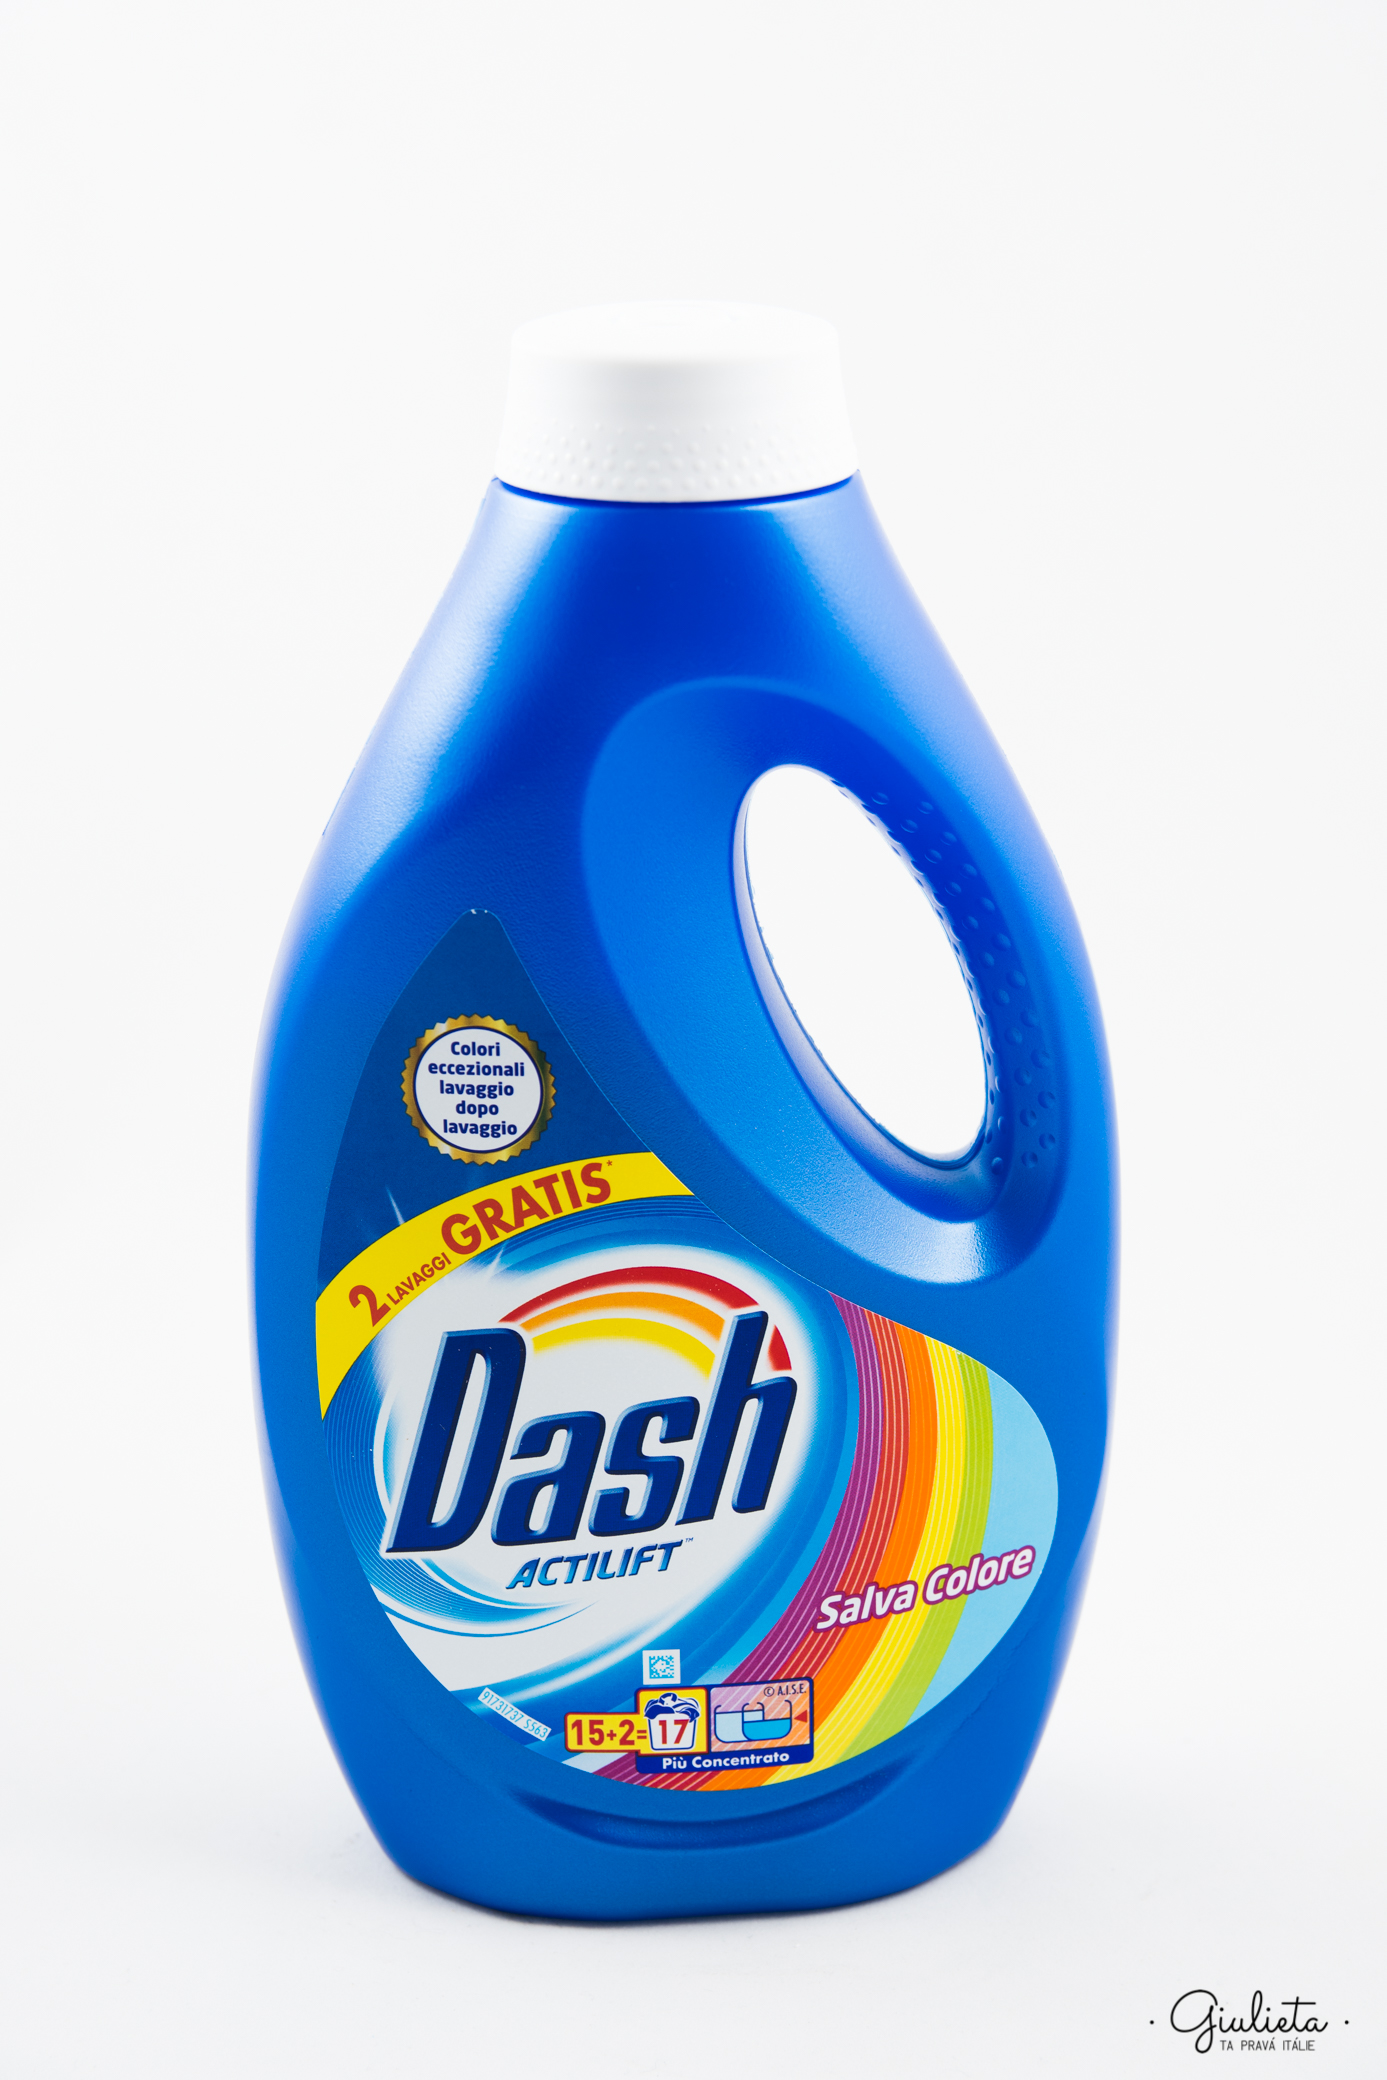 Dash prací gel Actilift Salva Colore, 15+2 pracích dávek